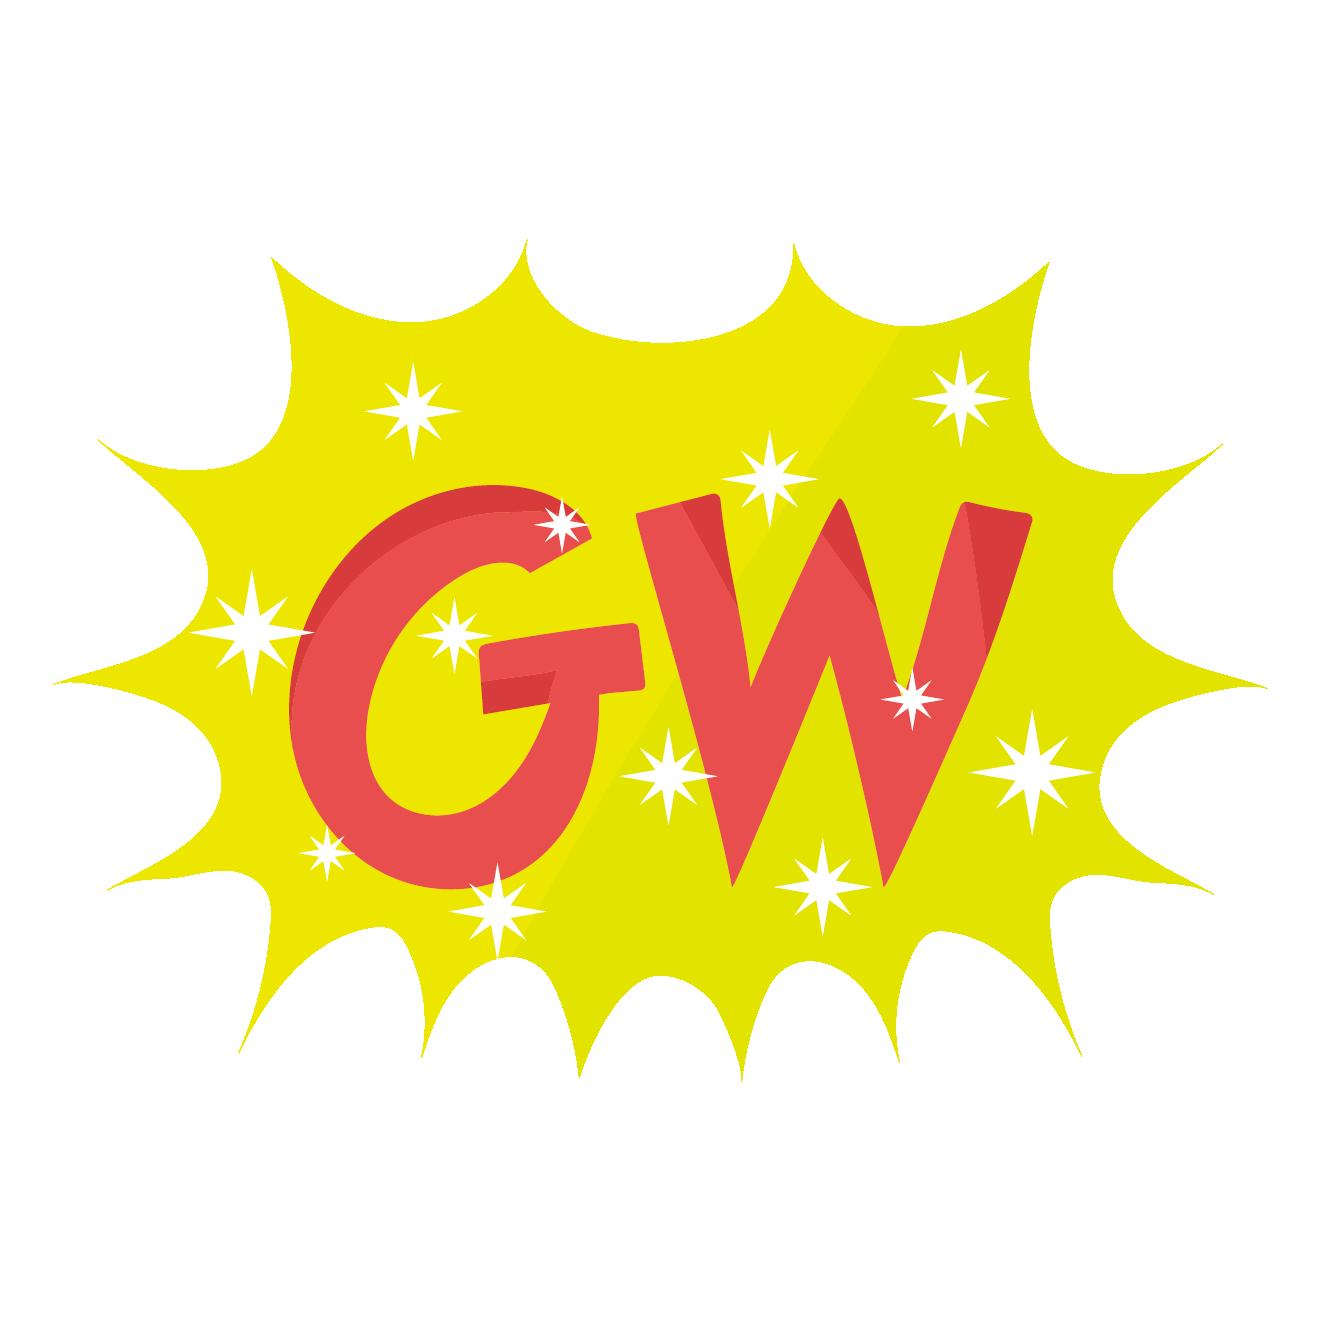 gw!ゴールデンウィークの文字(ロゴ)マーク イラスト   商用フリー(無料